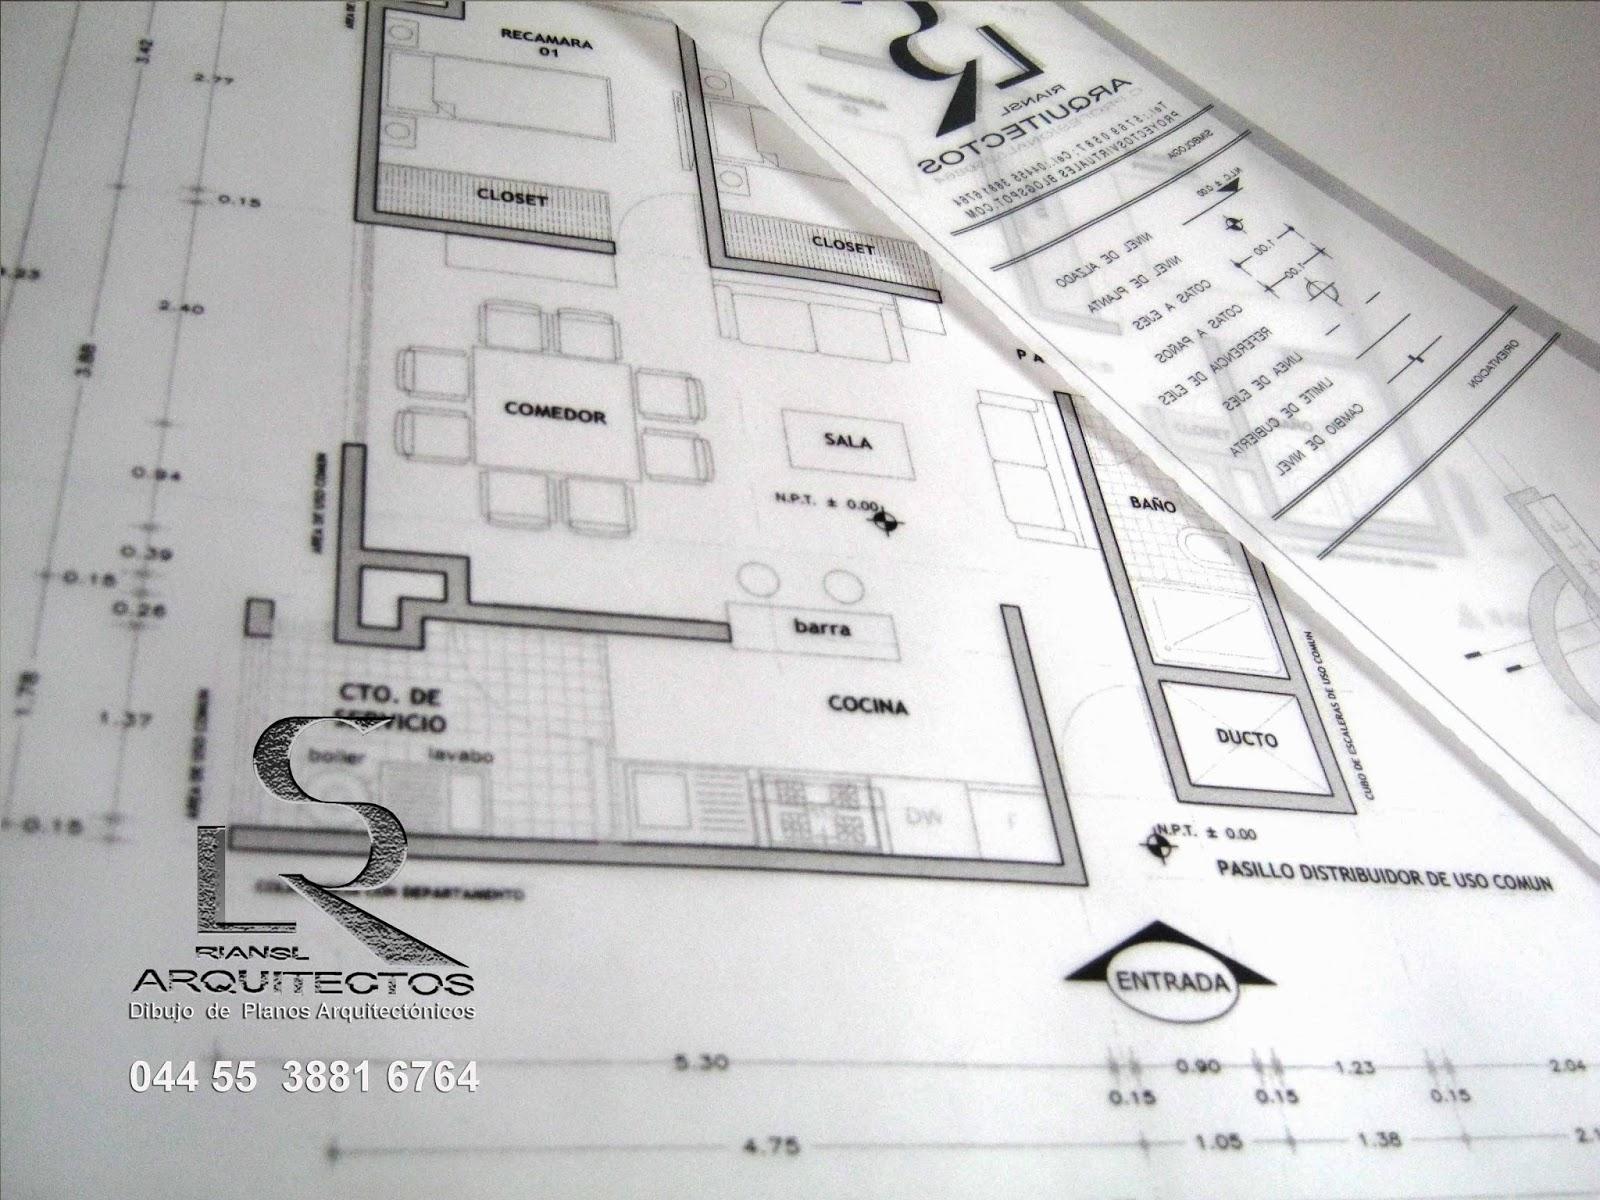 Arq rigoberto s nchez especialista en dibujo de planos for Pie de plano arquitectonico pdf